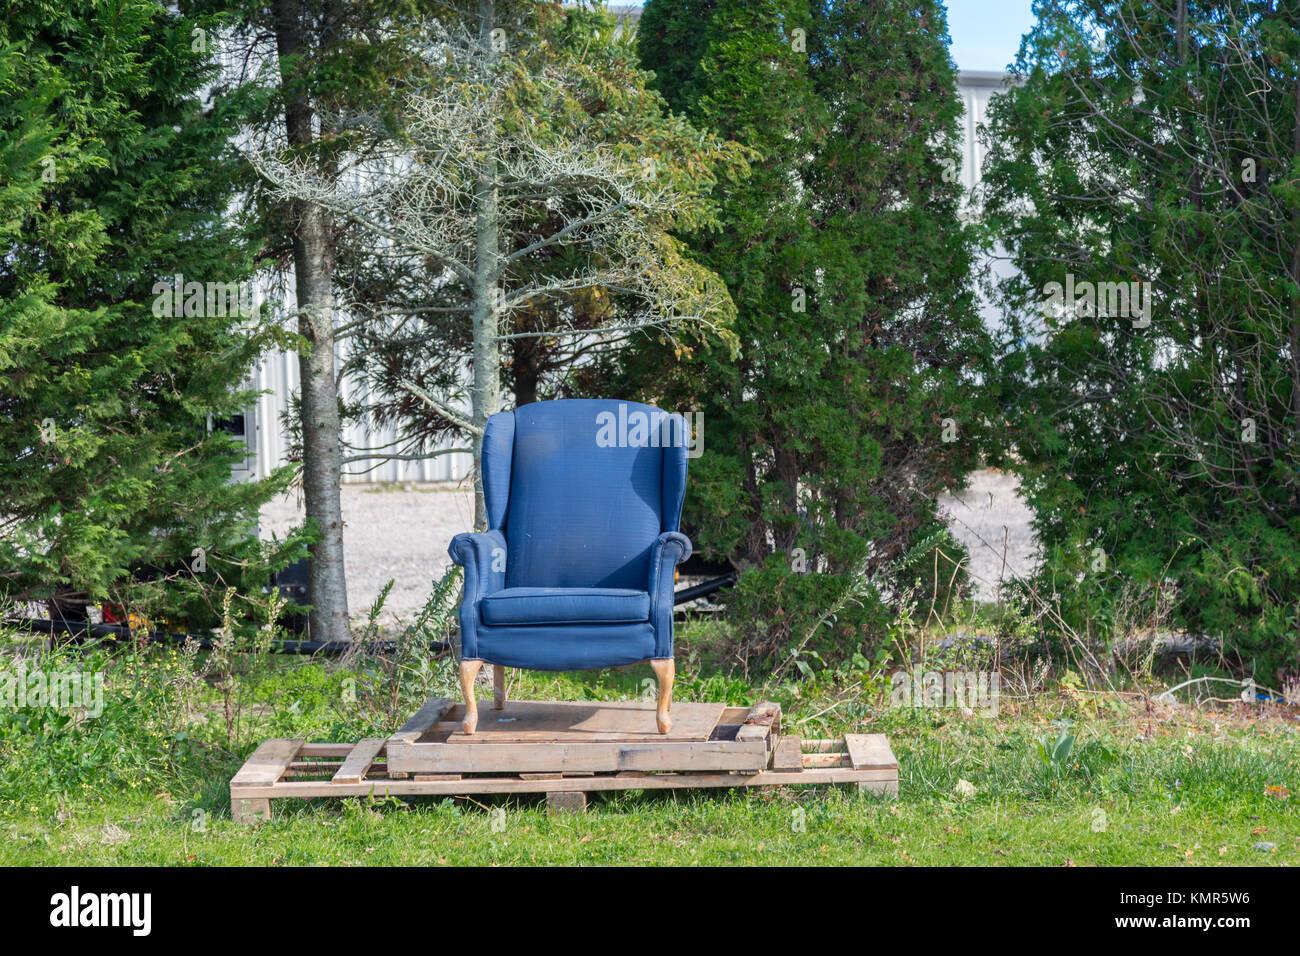 stuhl aus paletten elegant sitzmbel aus paletten with stuhl aus paletten gallery of stuhlthron. Black Bedroom Furniture Sets. Home Design Ideas